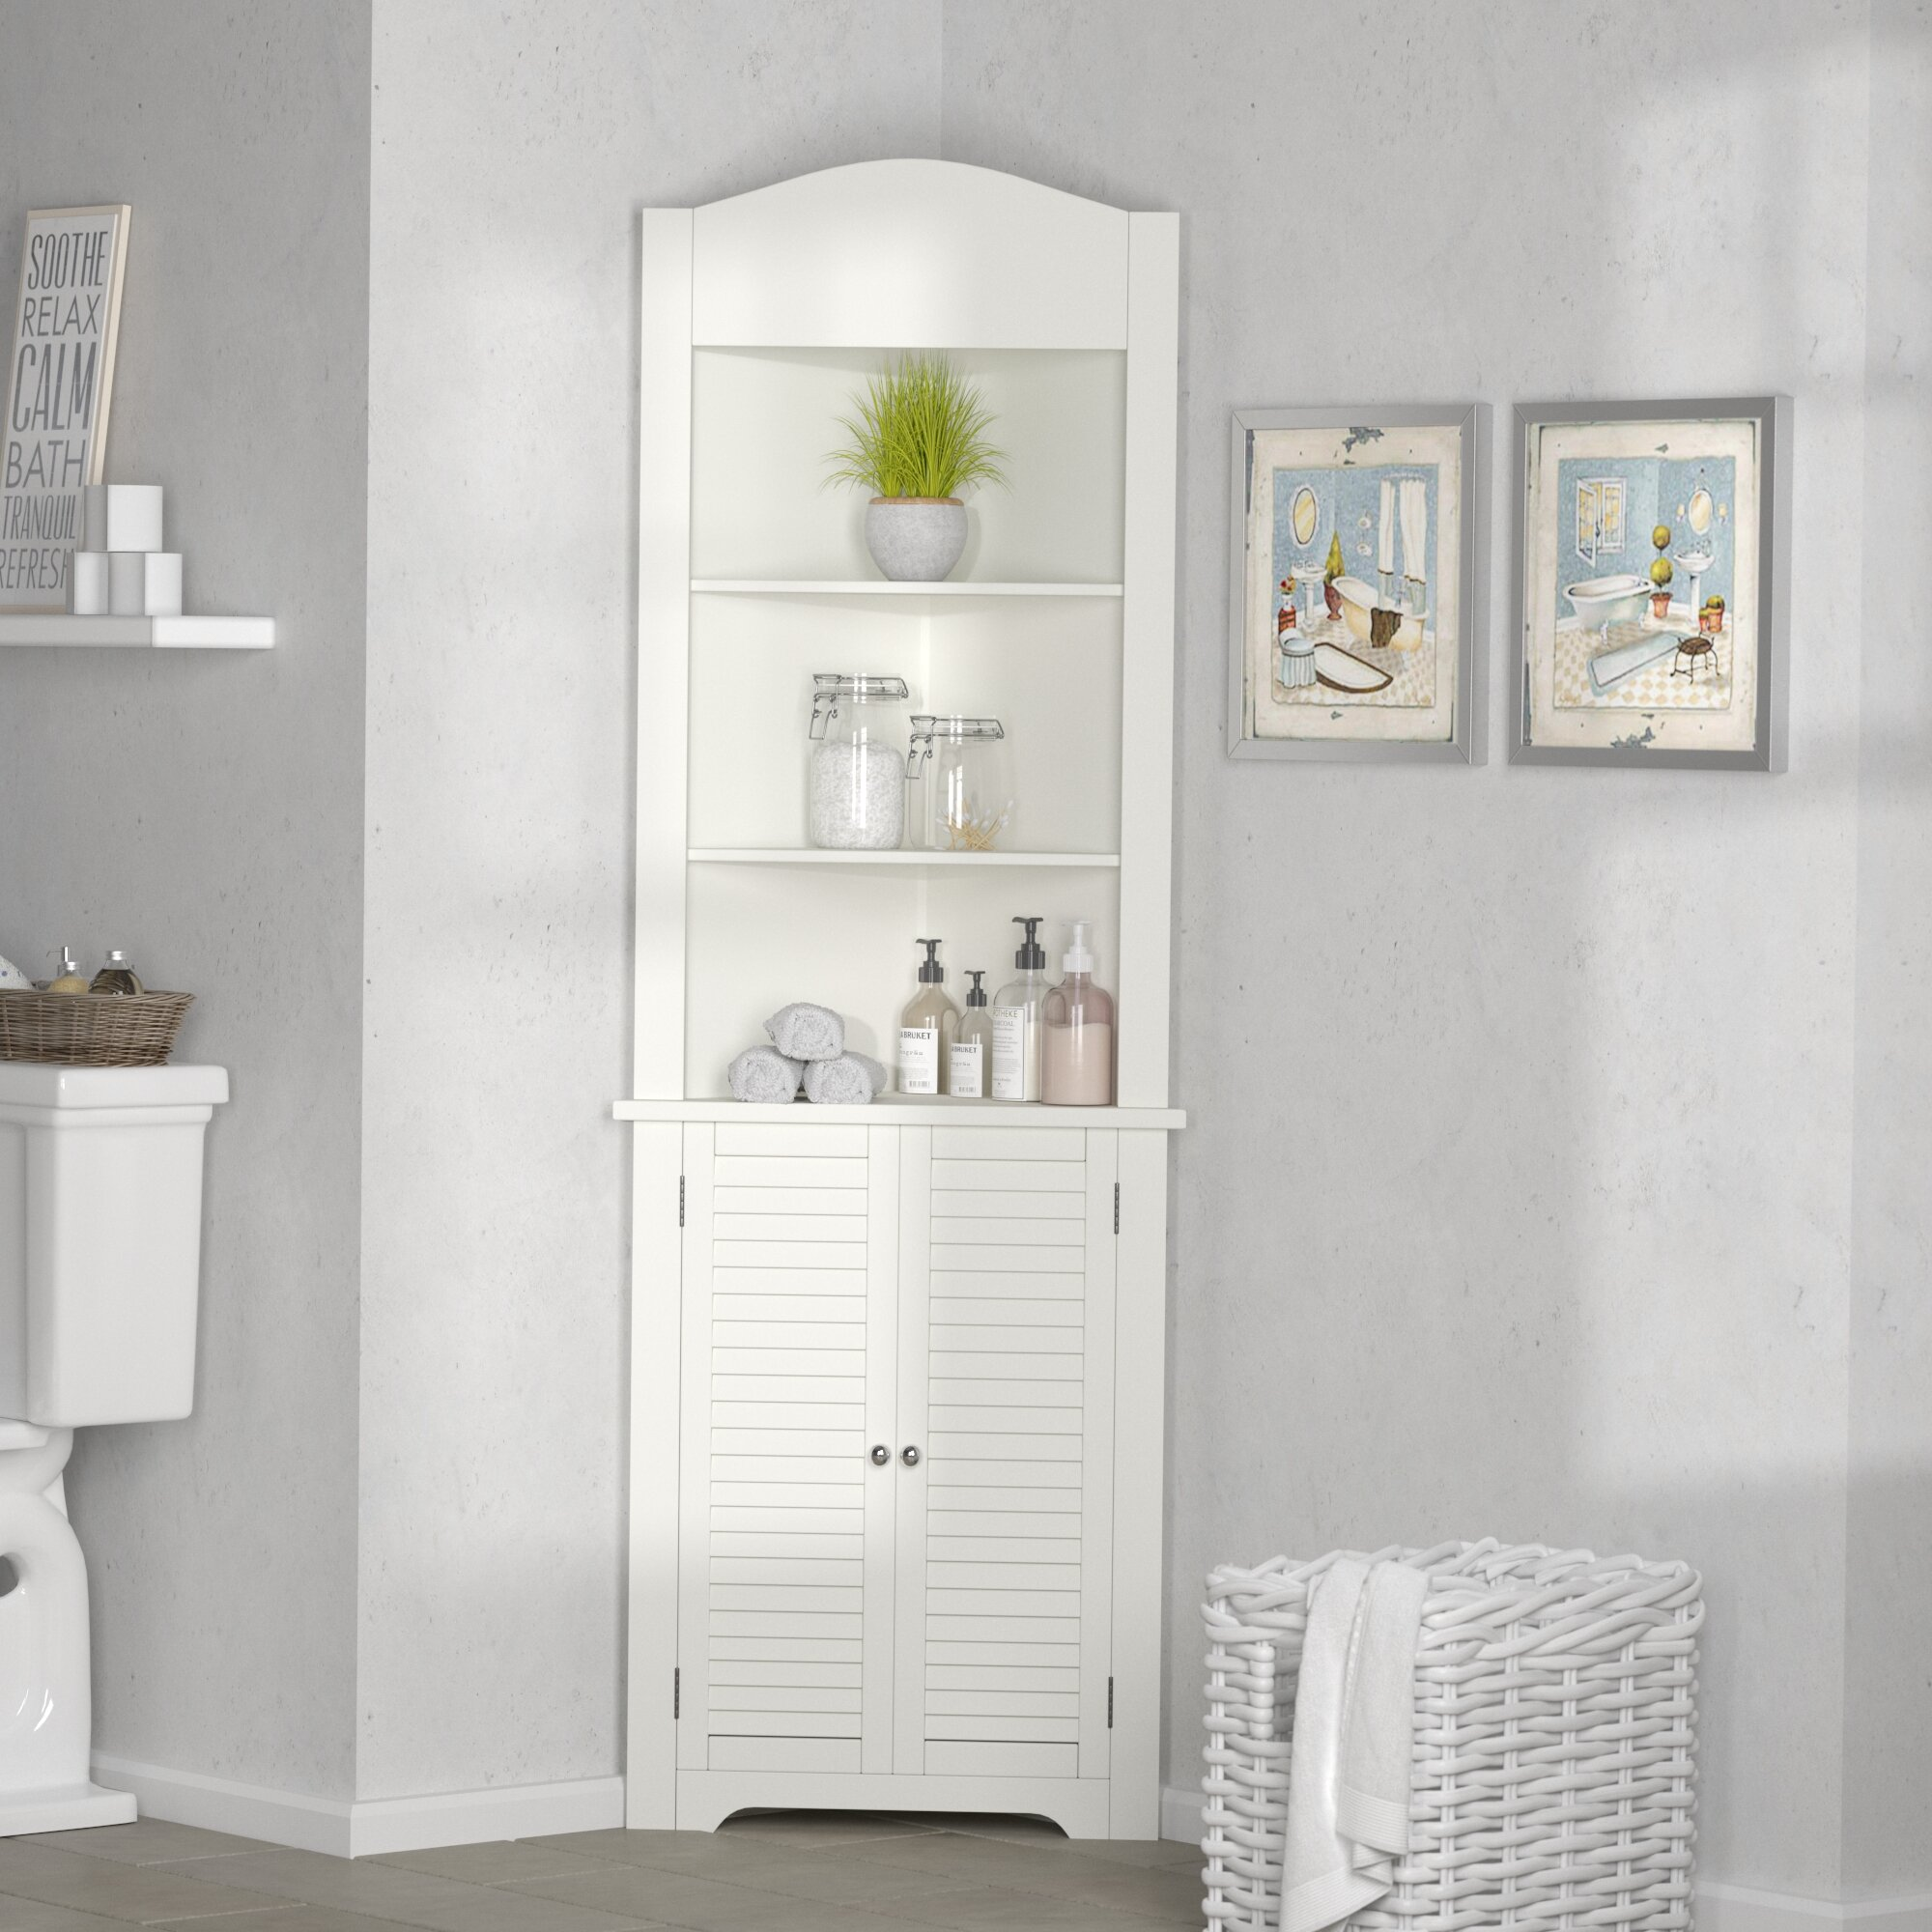 Rebrilliant Ellsworth 23 25 W X 68 31 H X 17 5 W Free Standing Linen Cabinet Reviews Wayfair